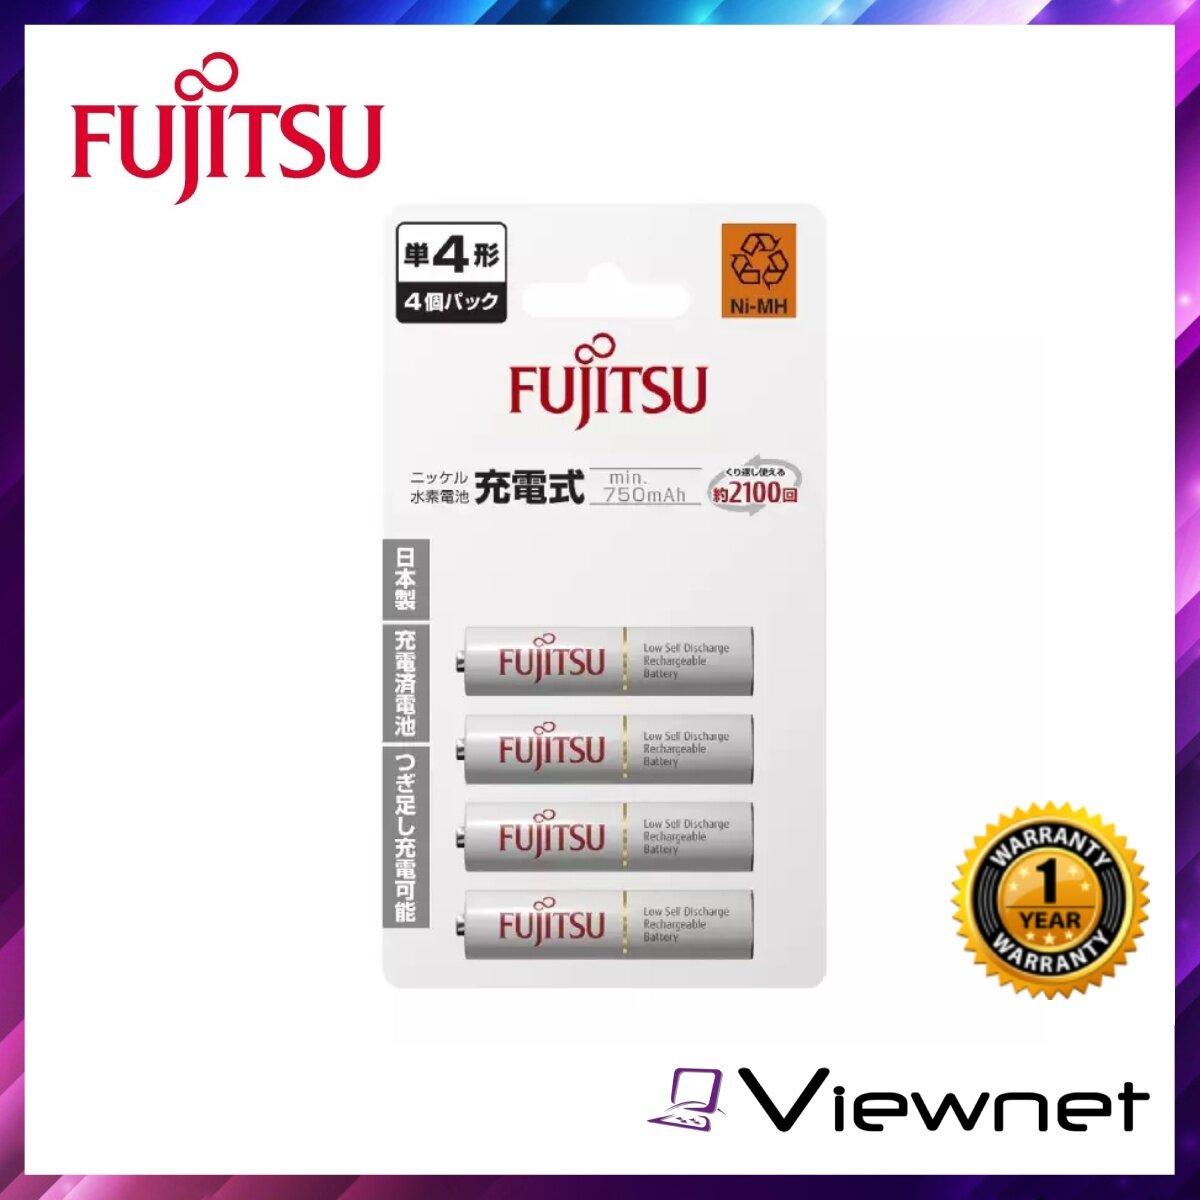 Fujitsu Rechargeable AAA Battery 4Pcs 750mAH (HR-4UTC 4B), Rechargeable, Anti Corrosion